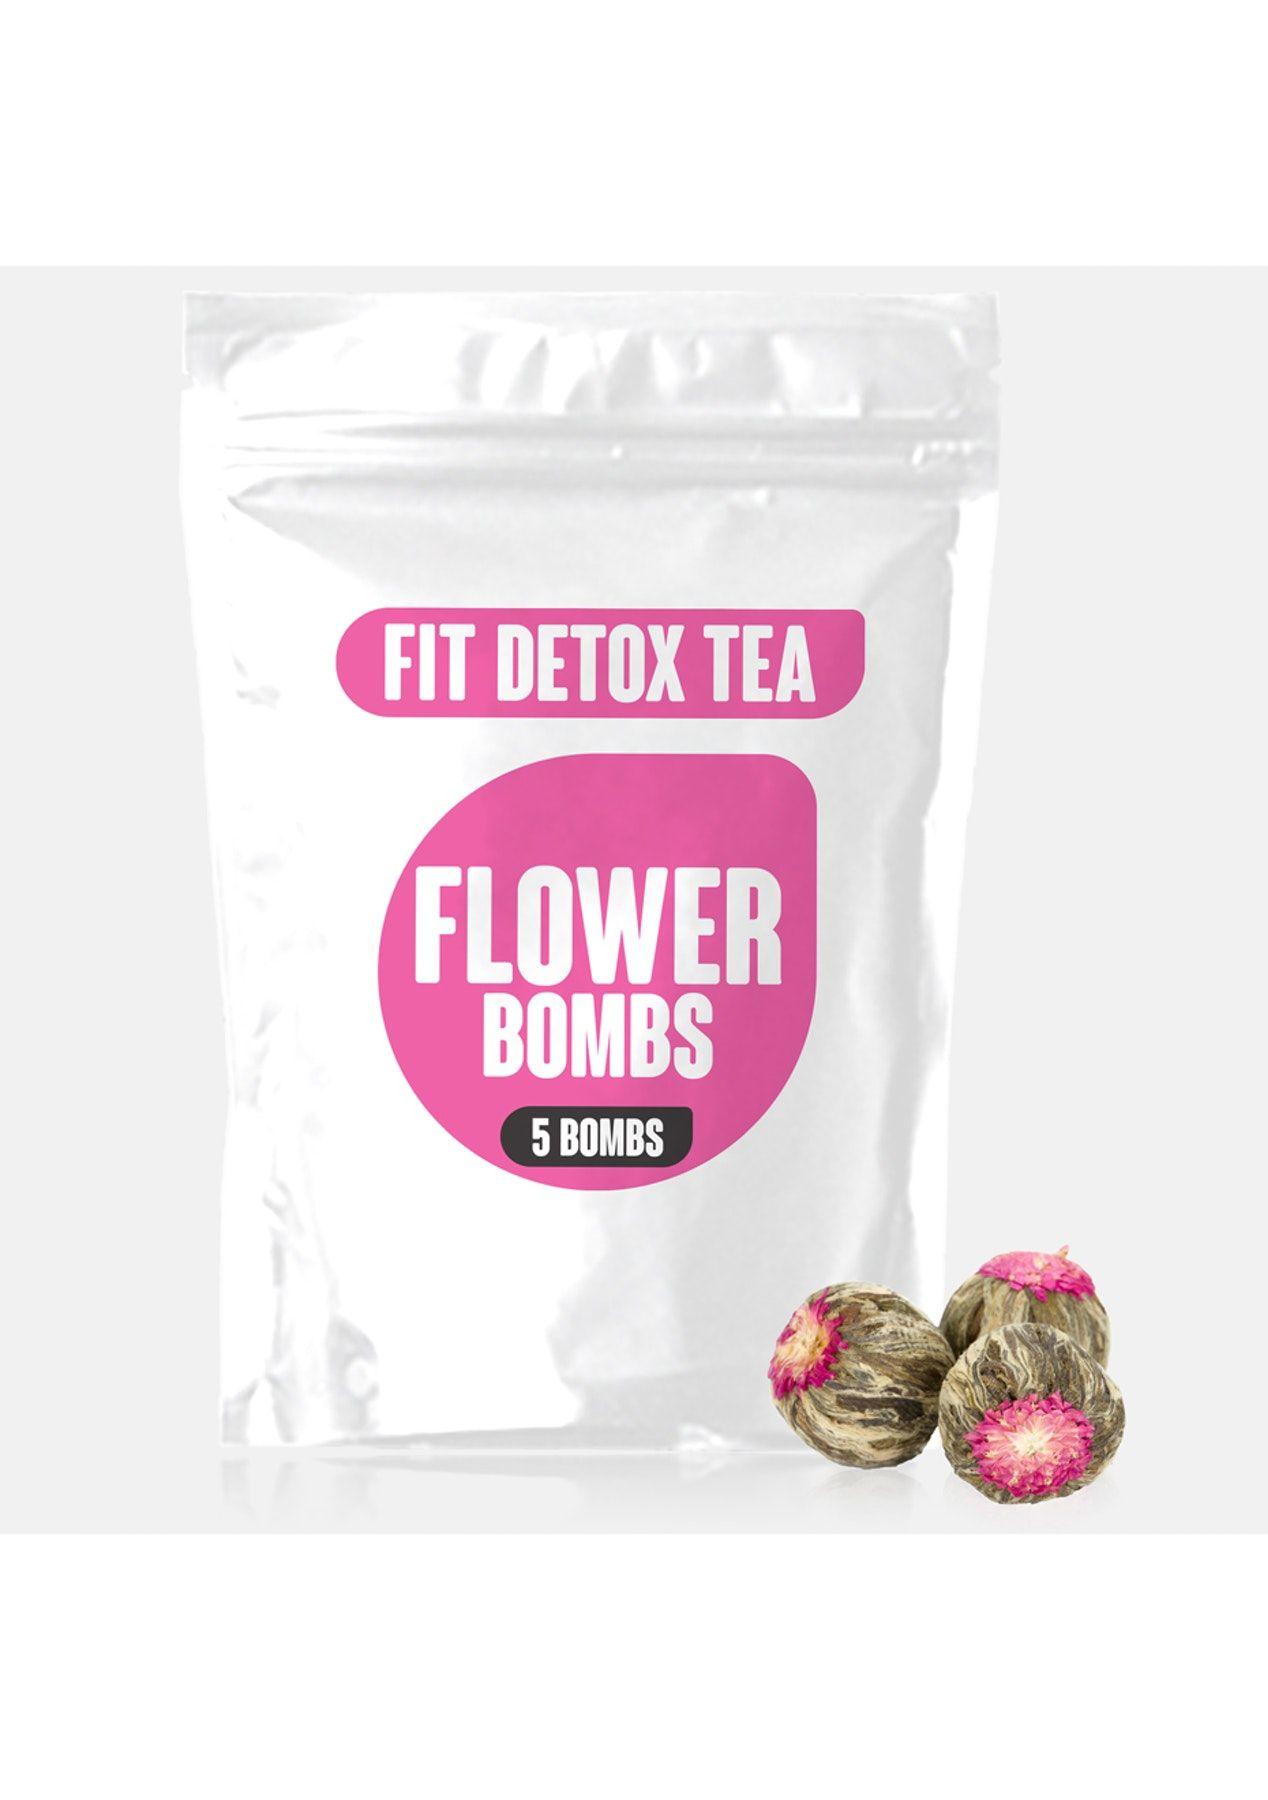 Fit detox tea flower bombs flower tea fit tea detox